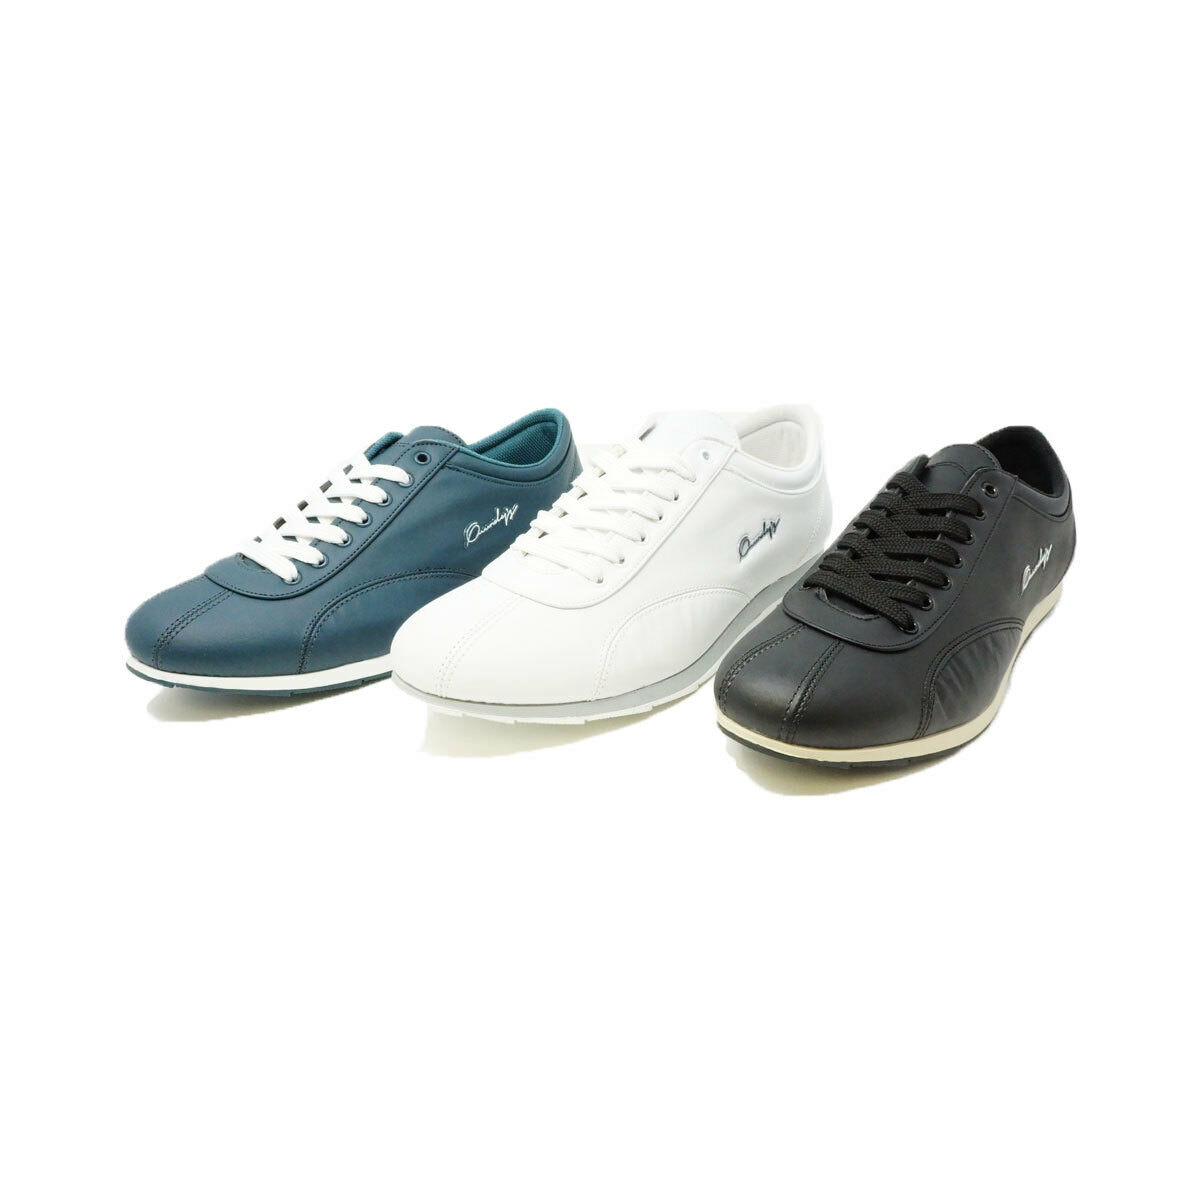 Futoli Comfortable Stylish Comfortable Breathable Walking shoes